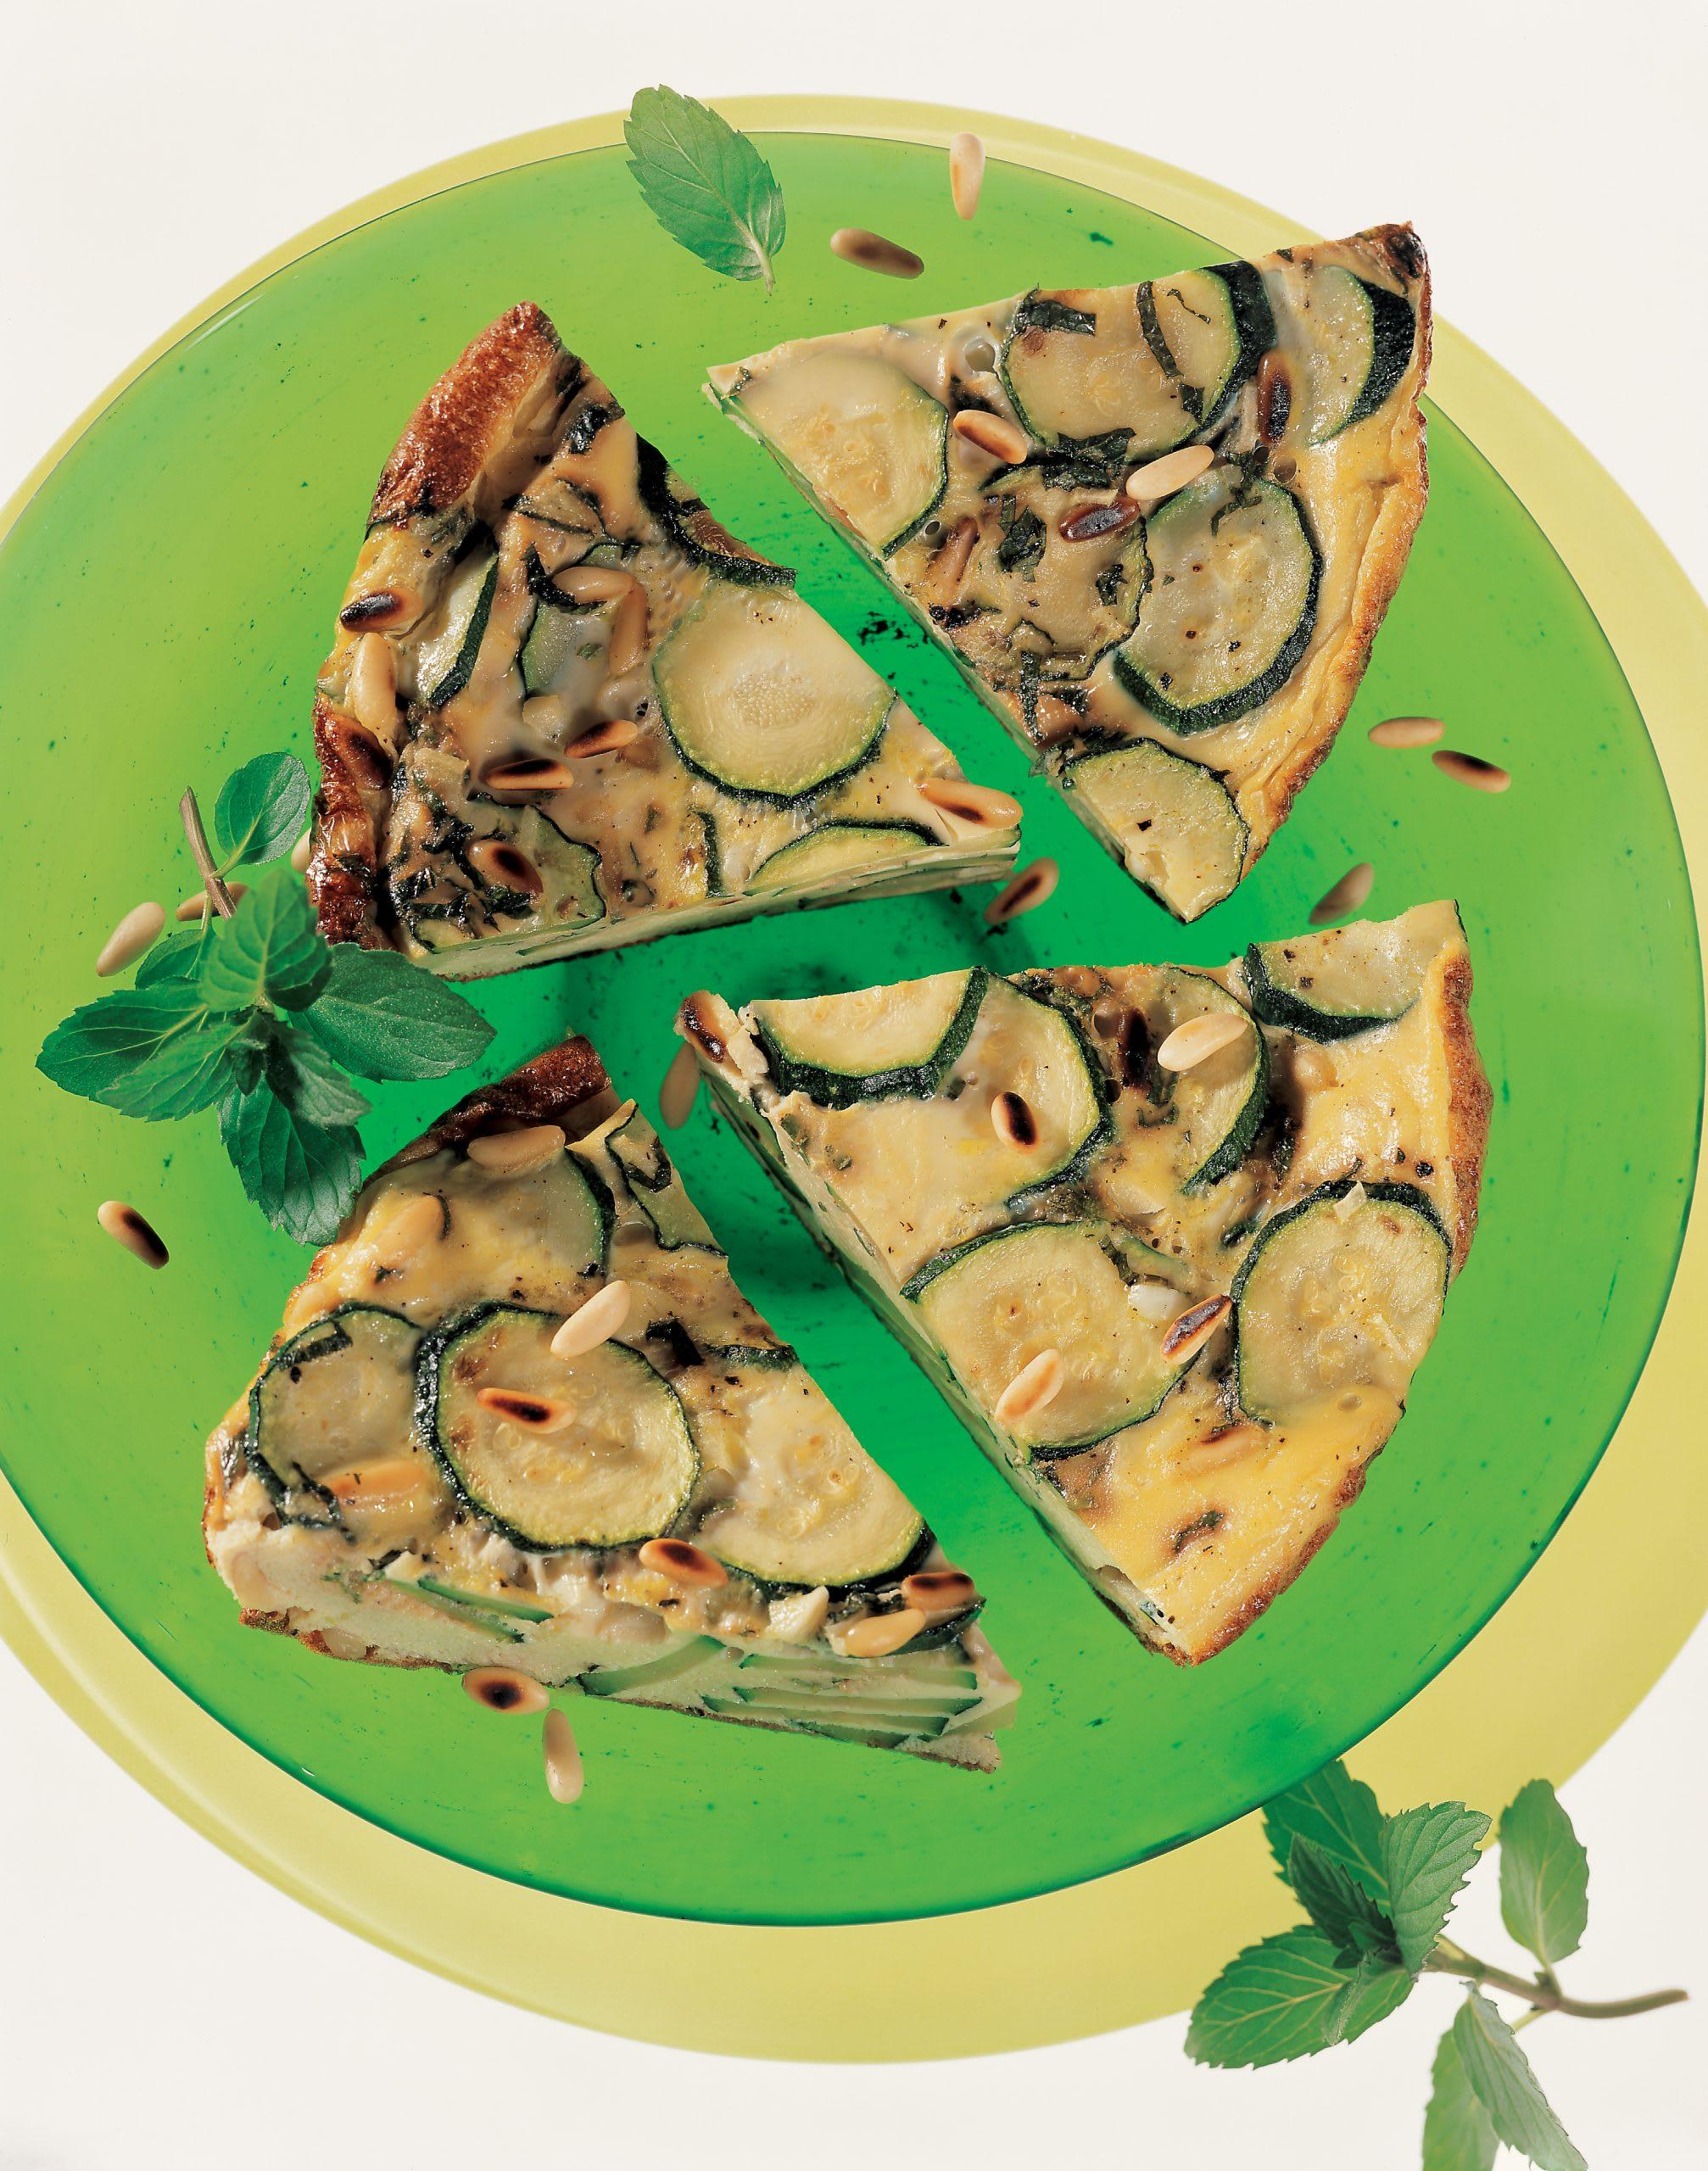 Zucchini-Tortilla mit Pfefferminz